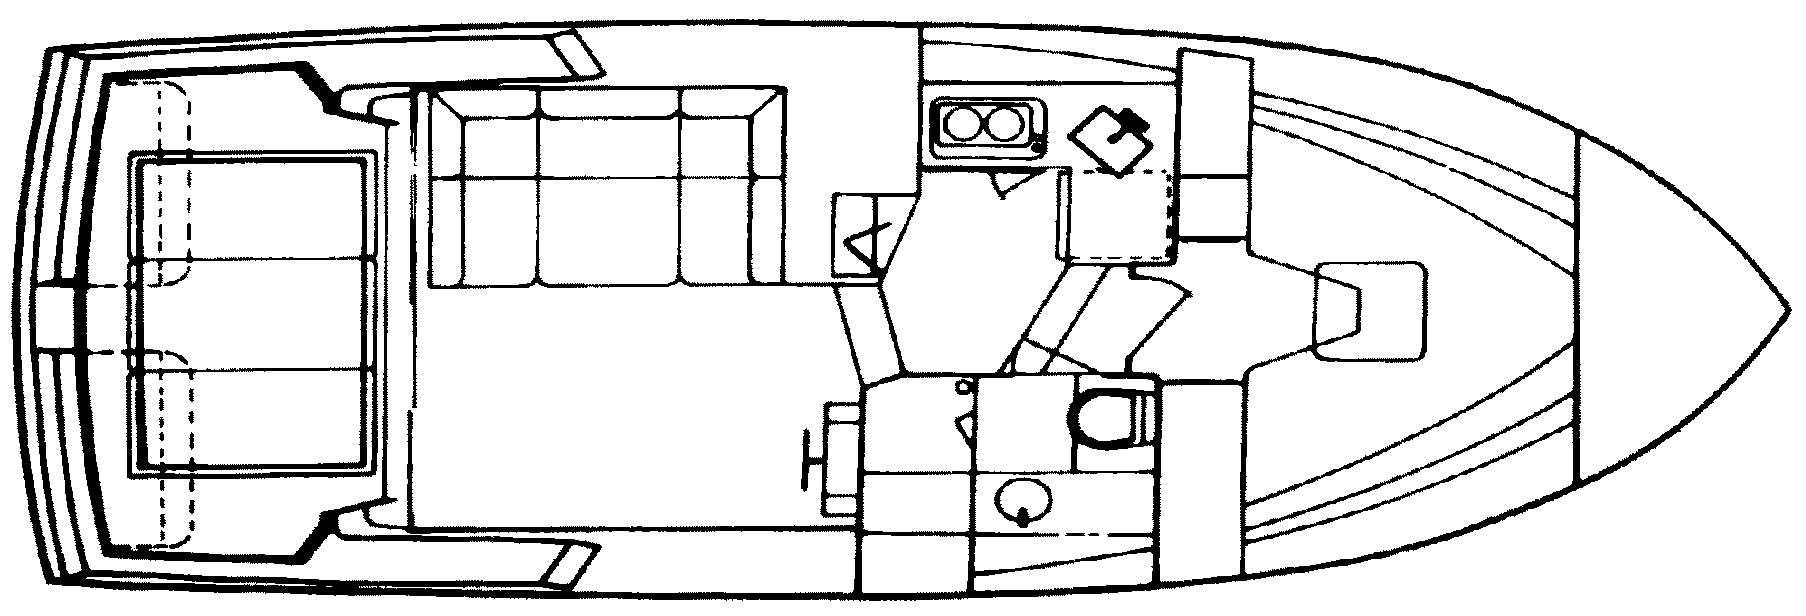 320 Amerosport Sedan Floor Plan 1